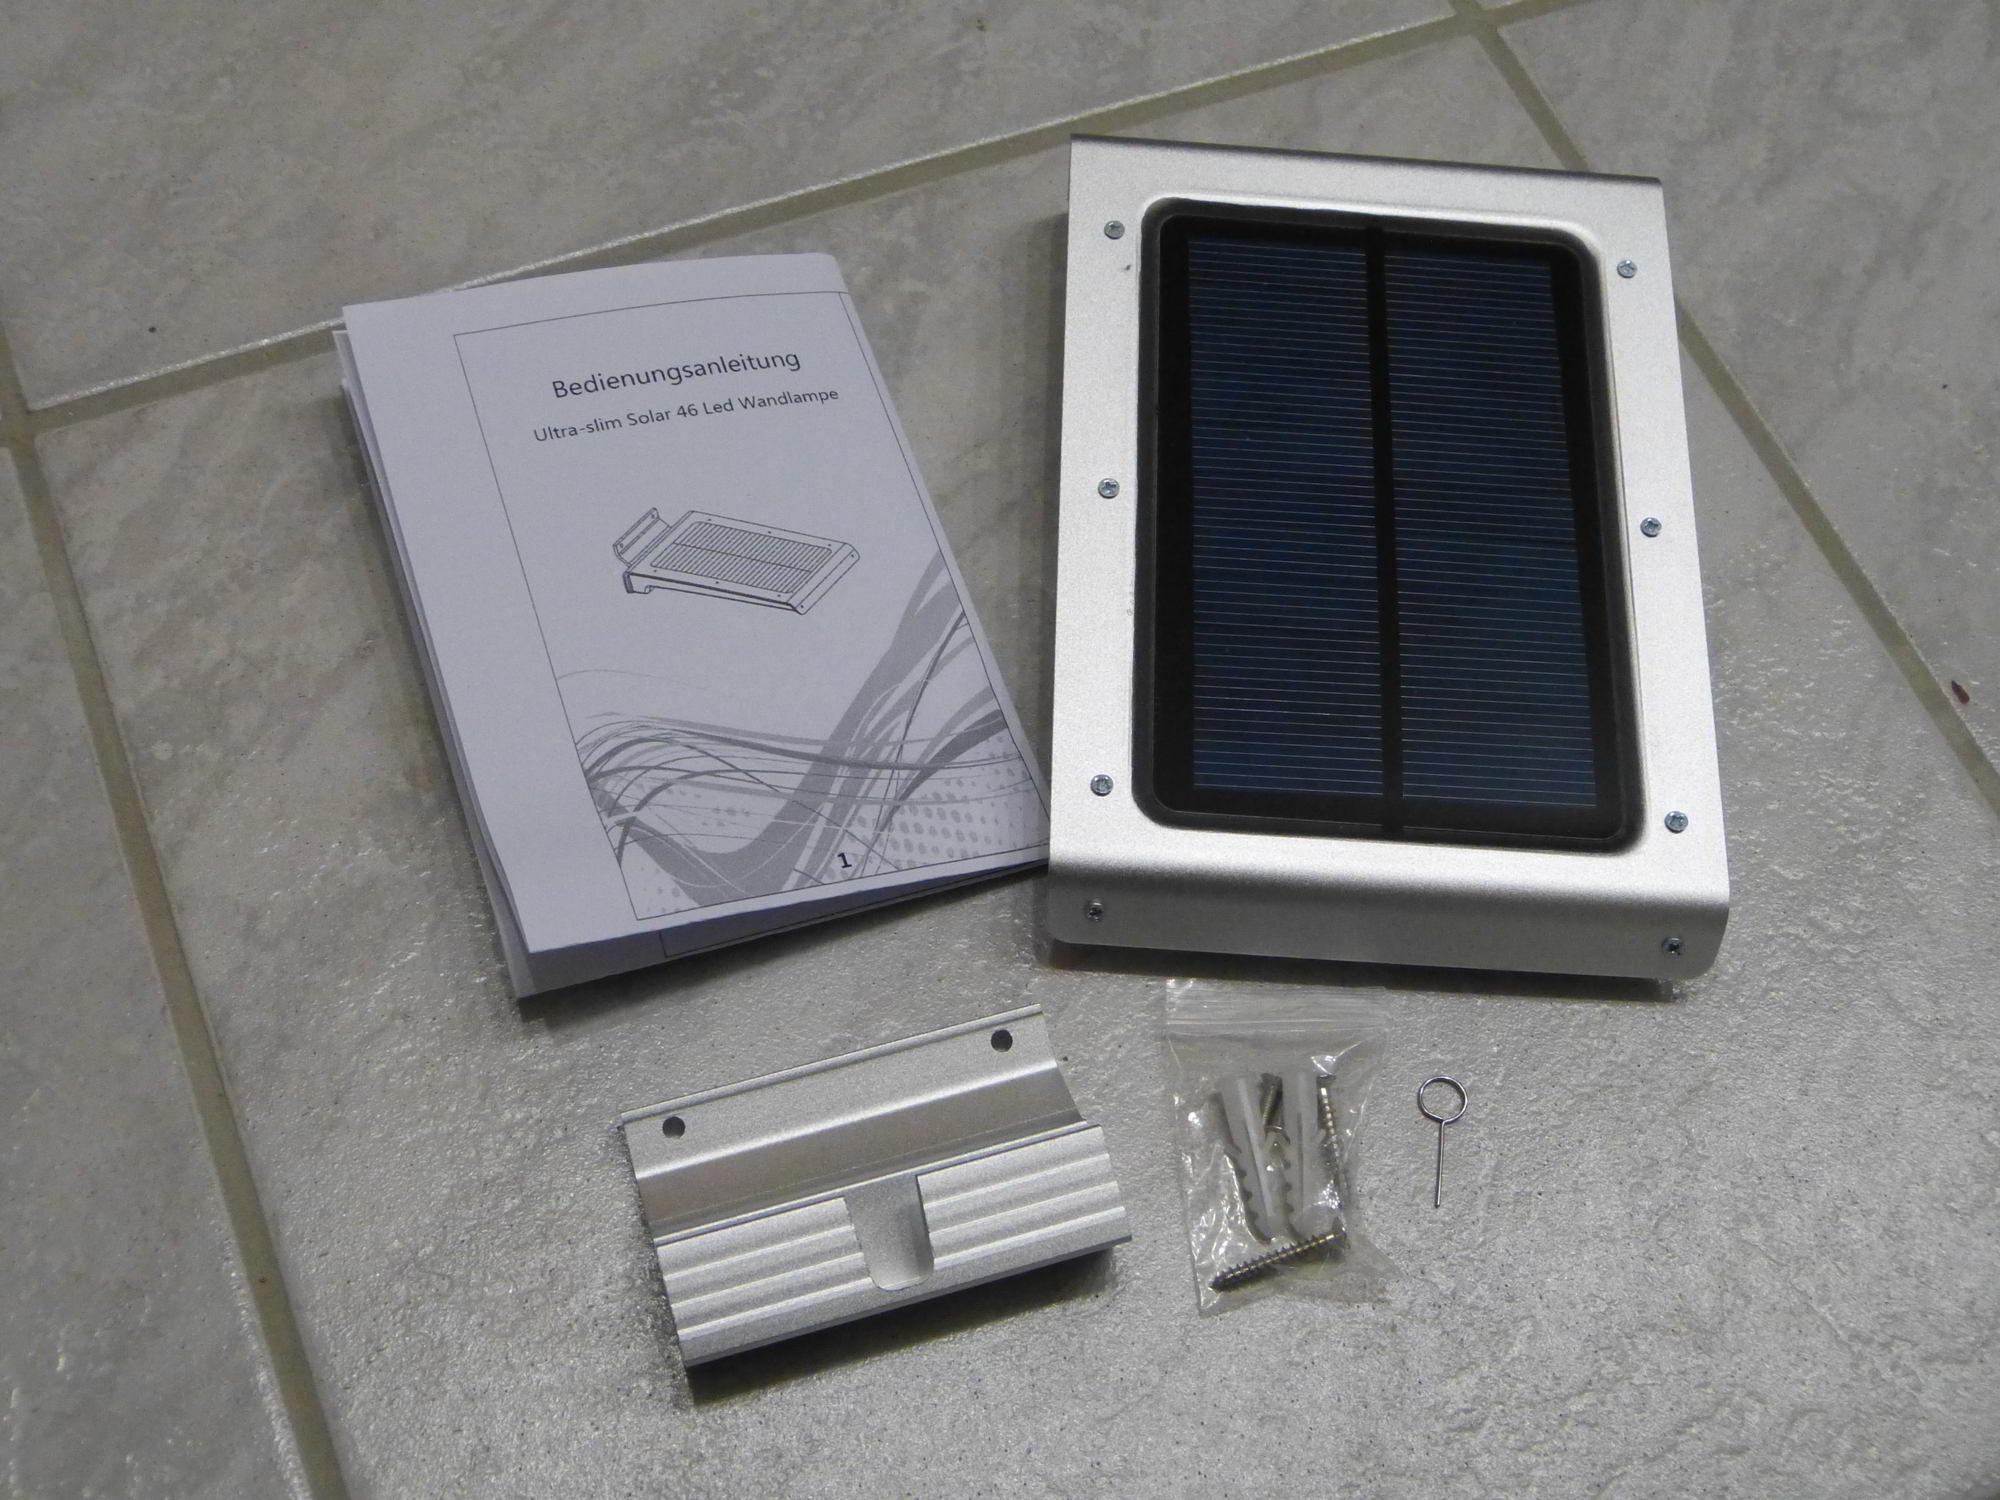 testbericht led solar lampe mit vielen bildern micha 39 s blog. Black Bedroom Furniture Sets. Home Design Ideas